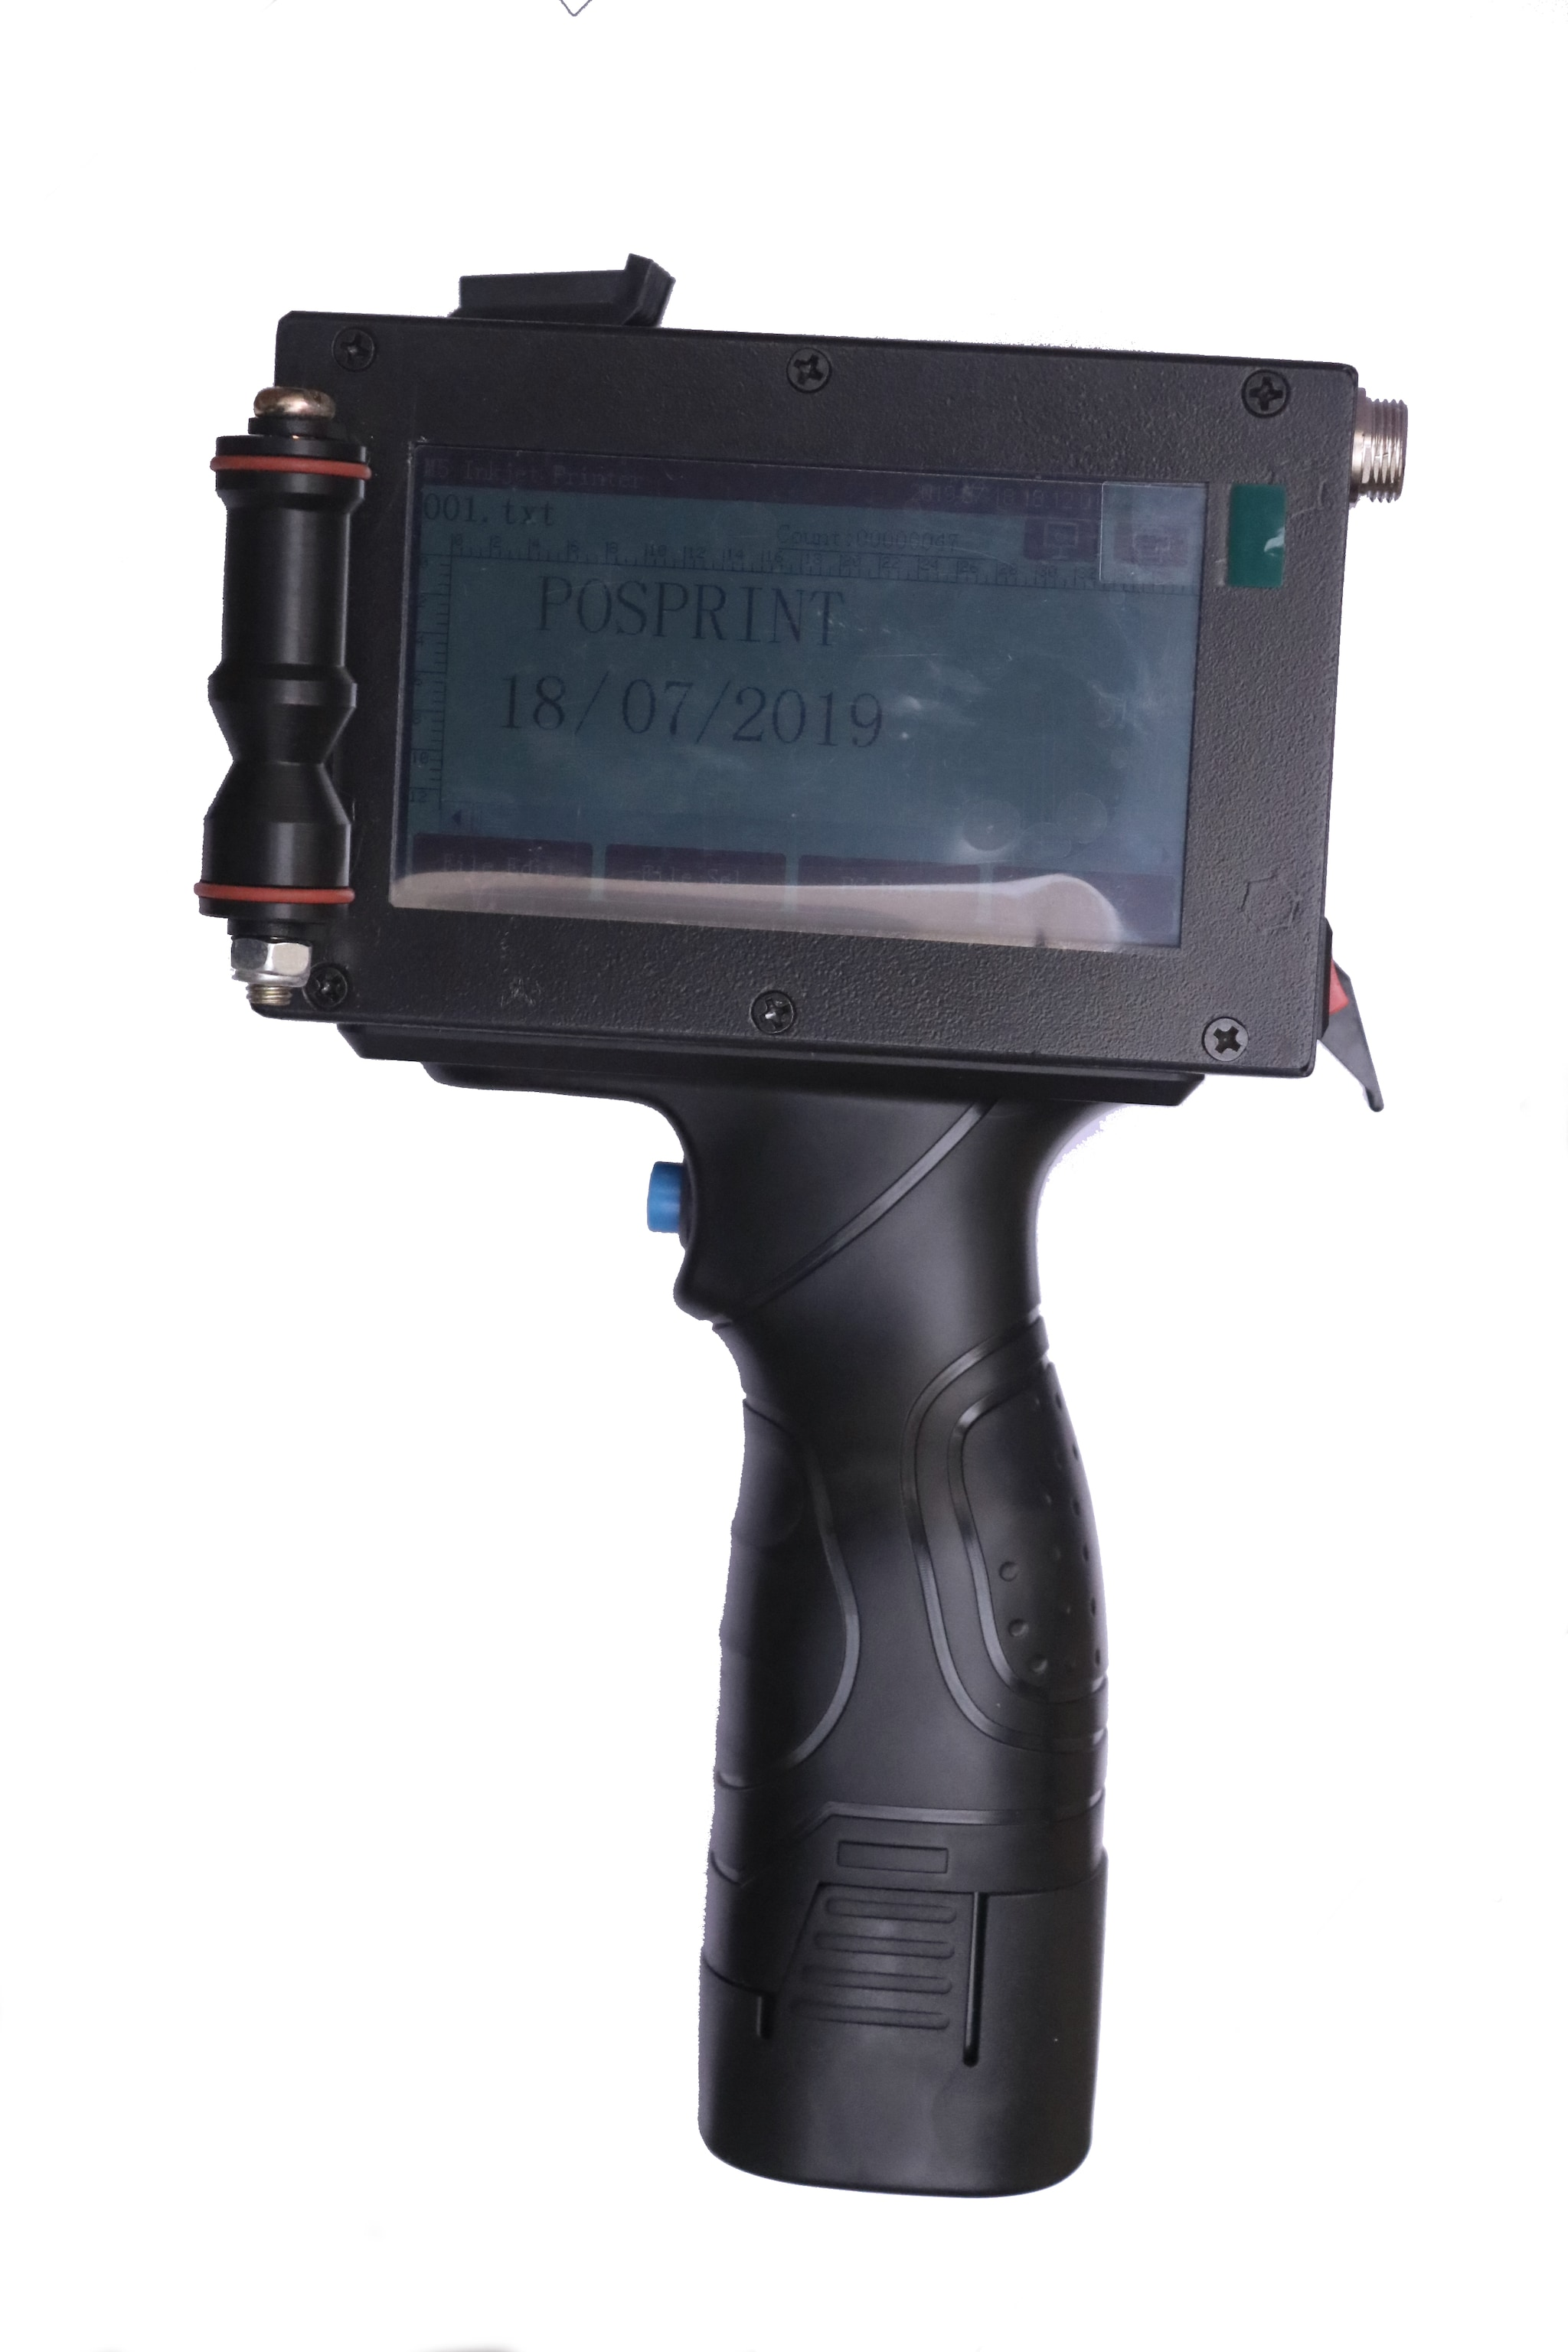 Posprint M5 Handheld Inkjet Printer Batch Coding Machine